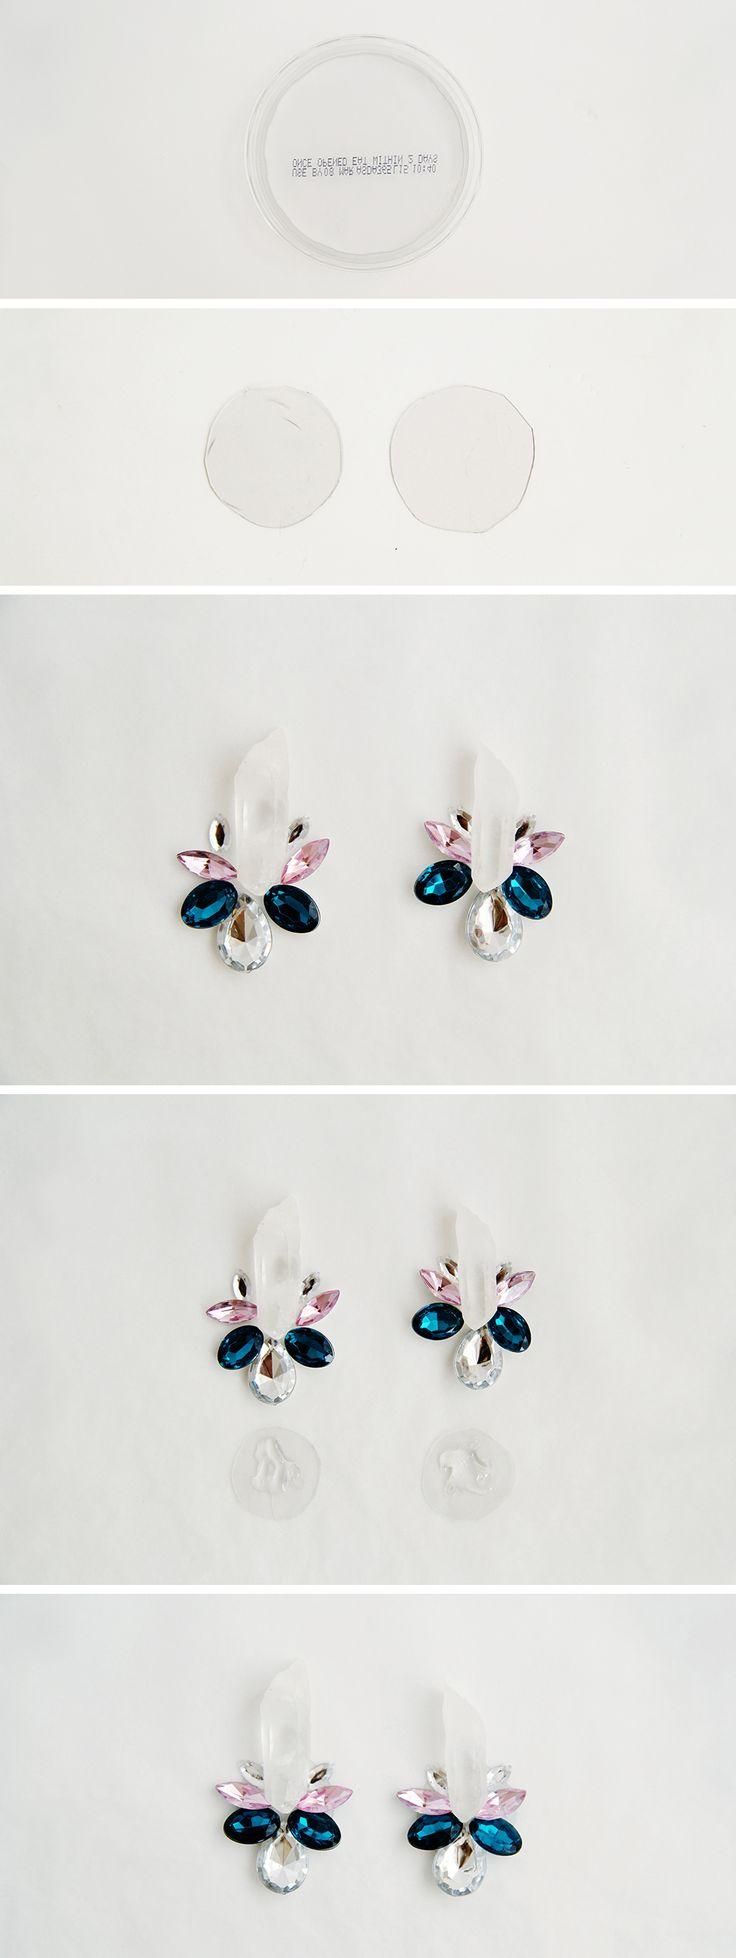 DIY Quartz Stone & Rhinestone Earrings | Fall For DIY